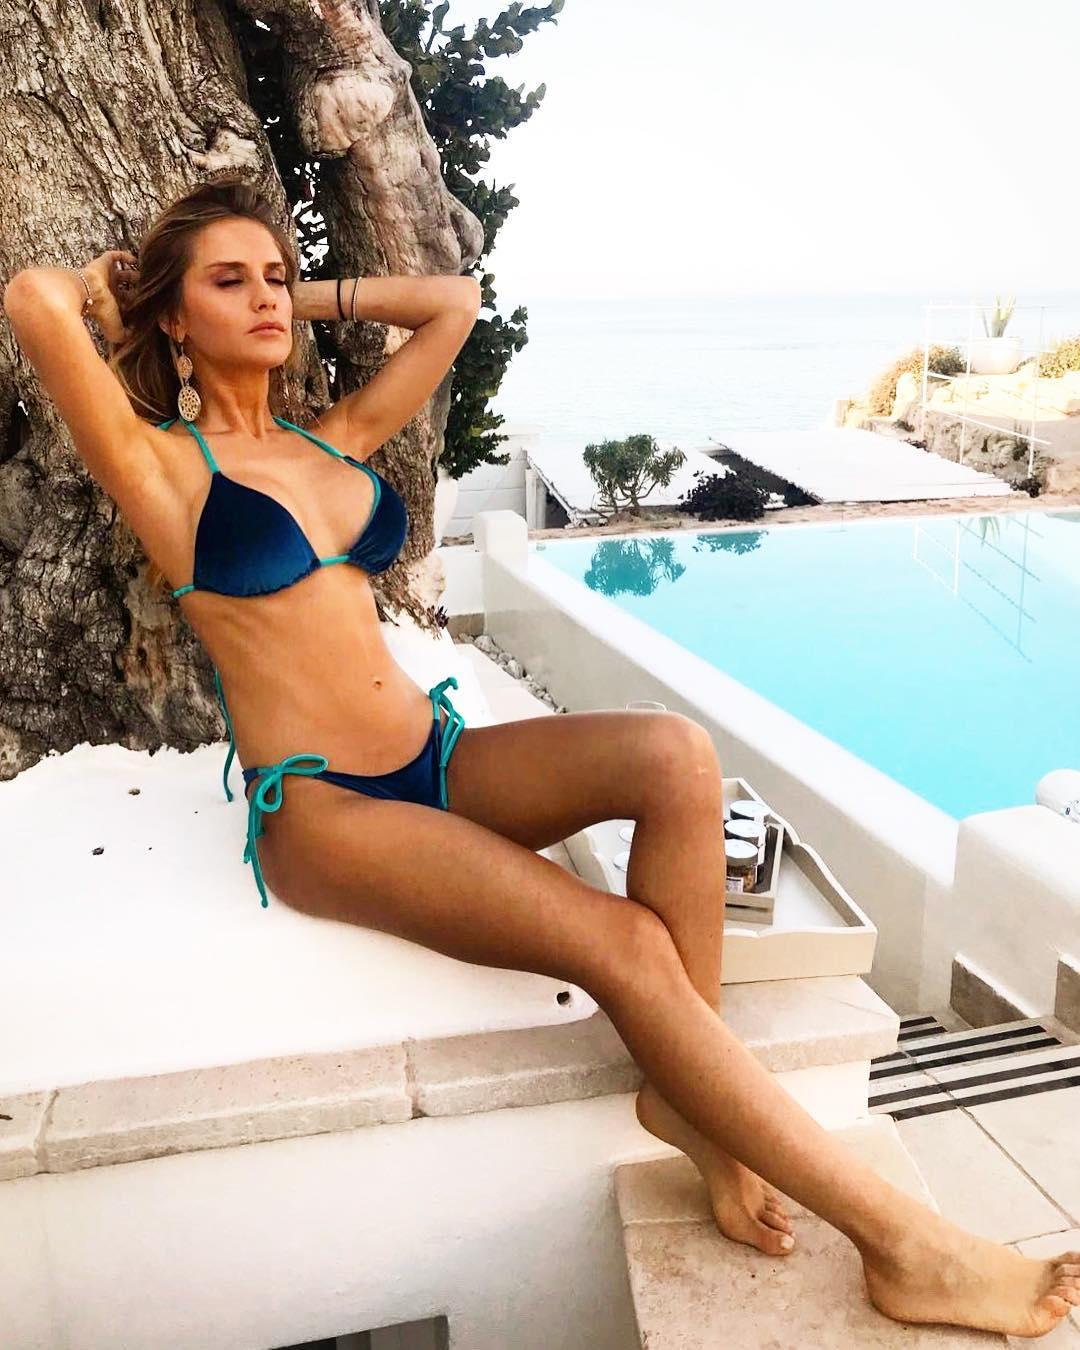 Michela Persico - Daniele Rugani